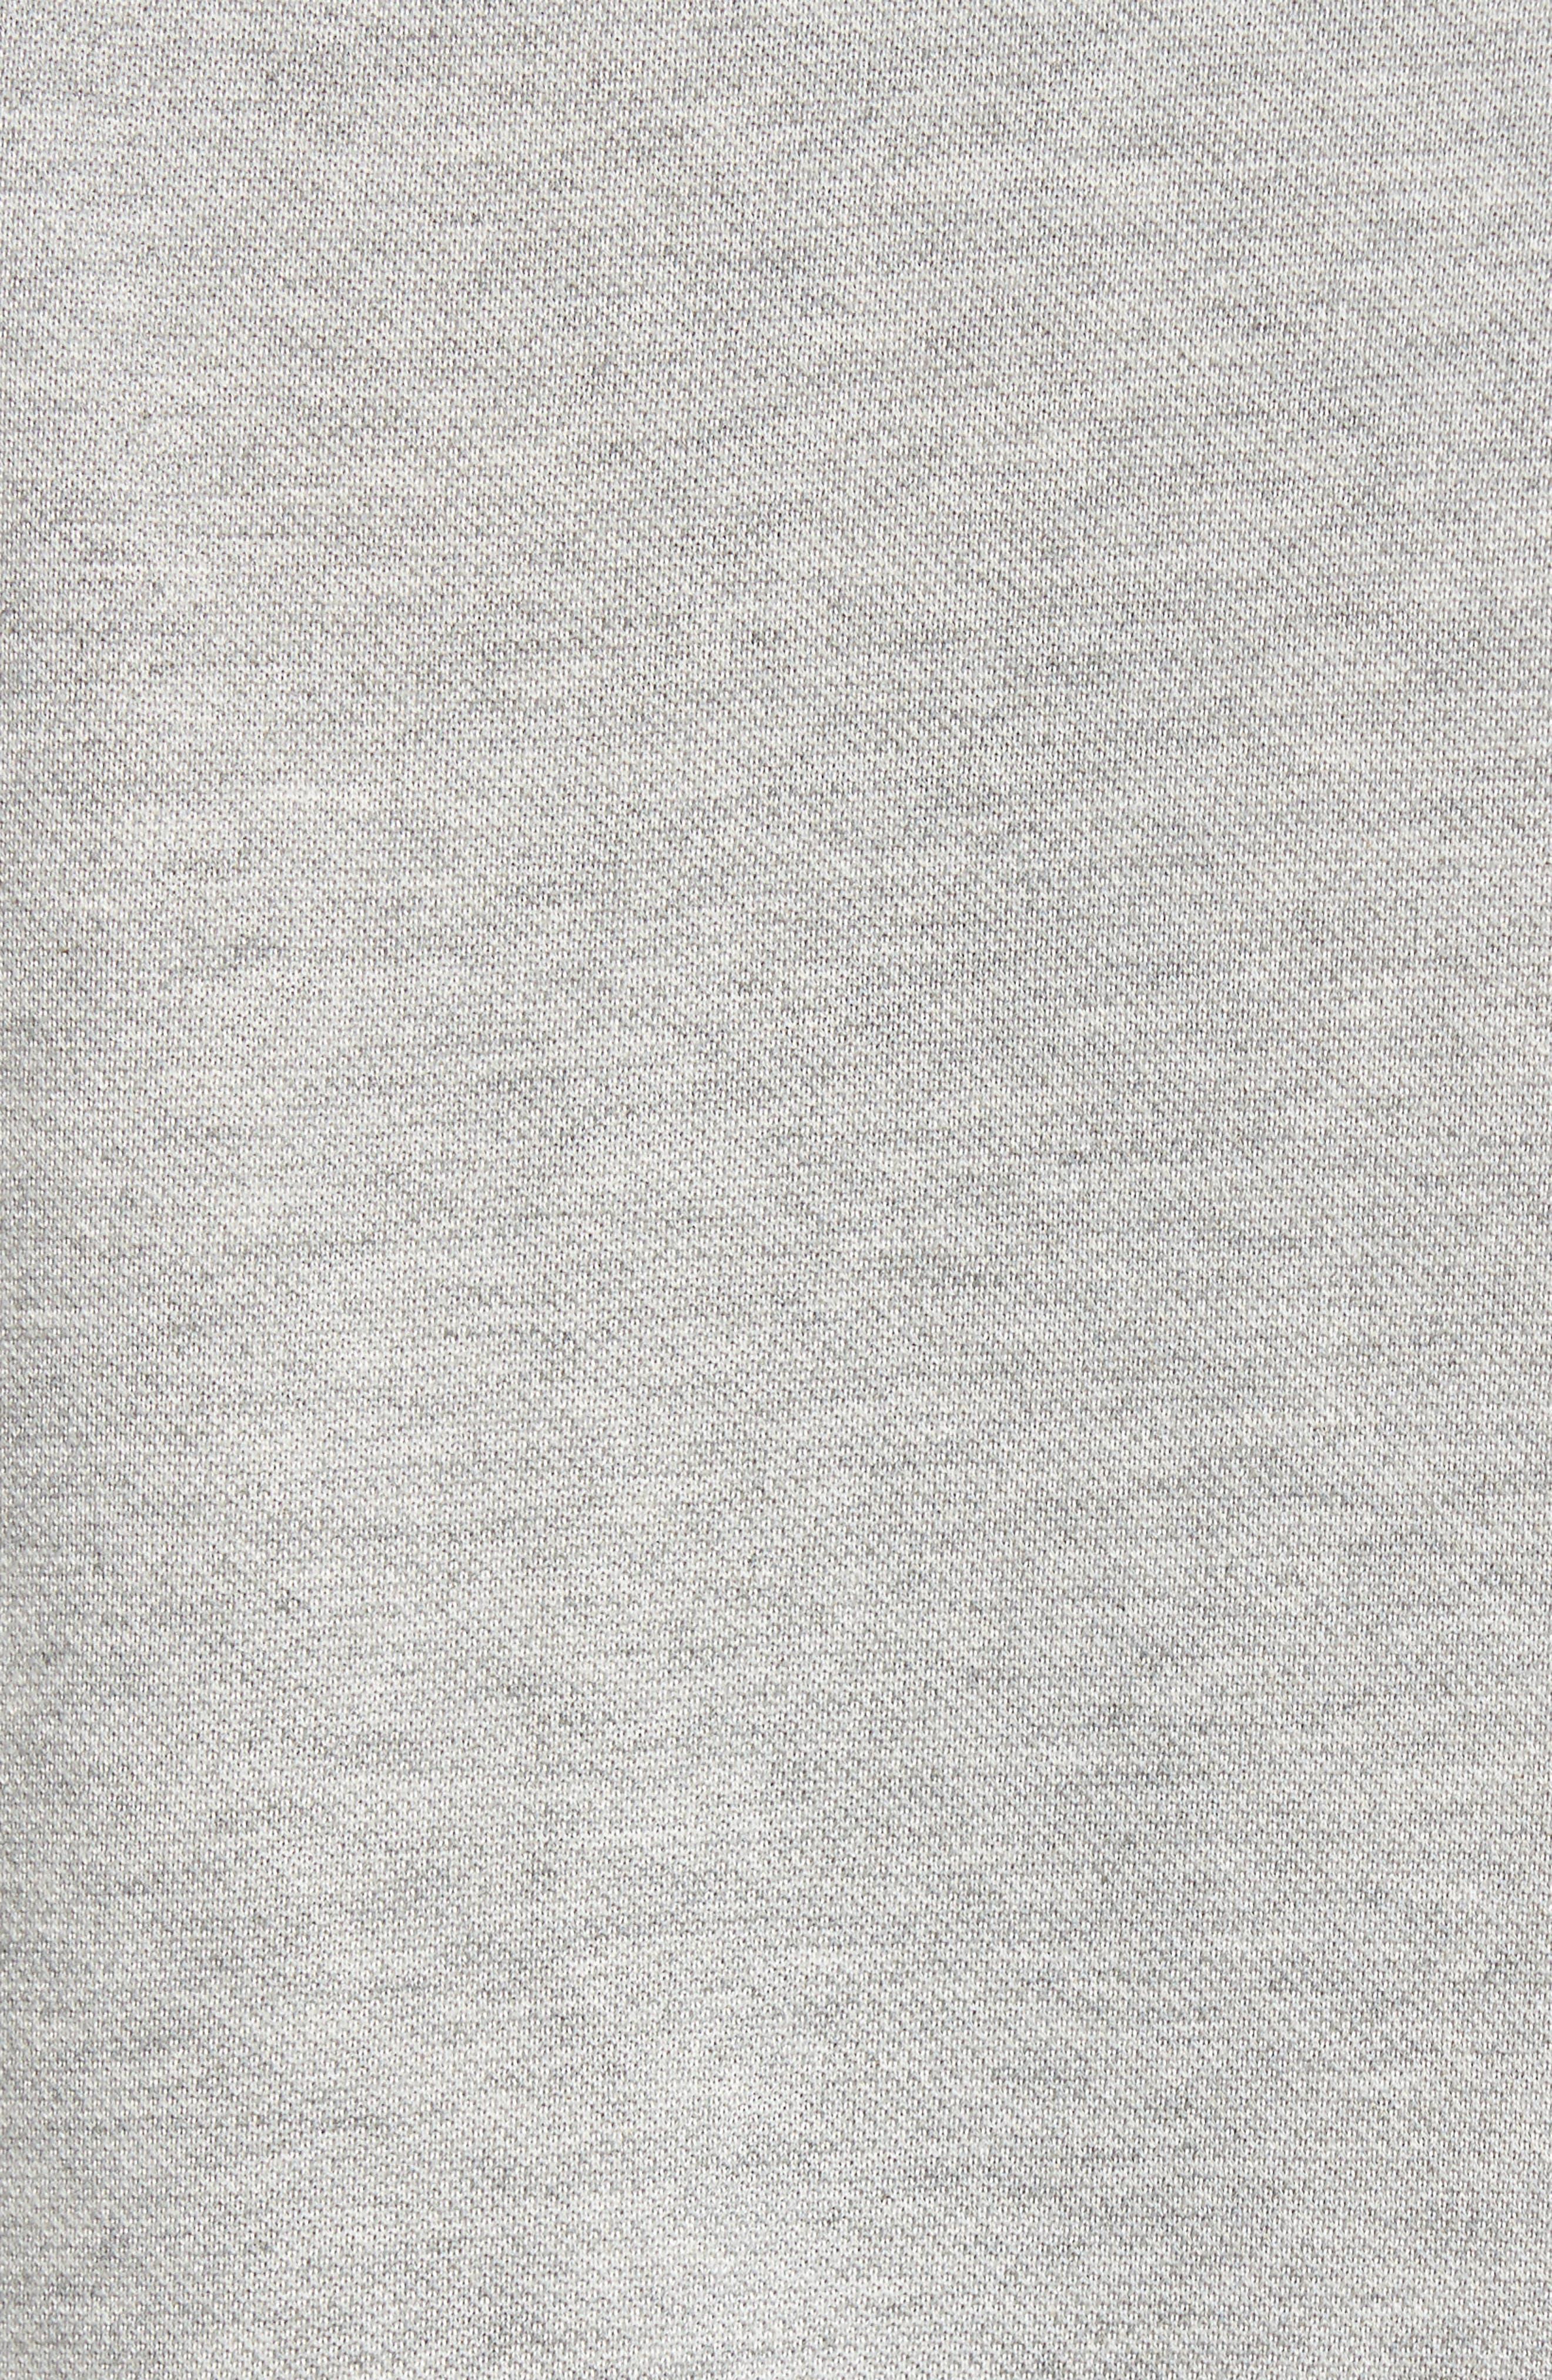 Dri-FIT Piqué Polo,                             Alternate thumbnail 5, color,                             Dark Grey Heather/ Anthracite